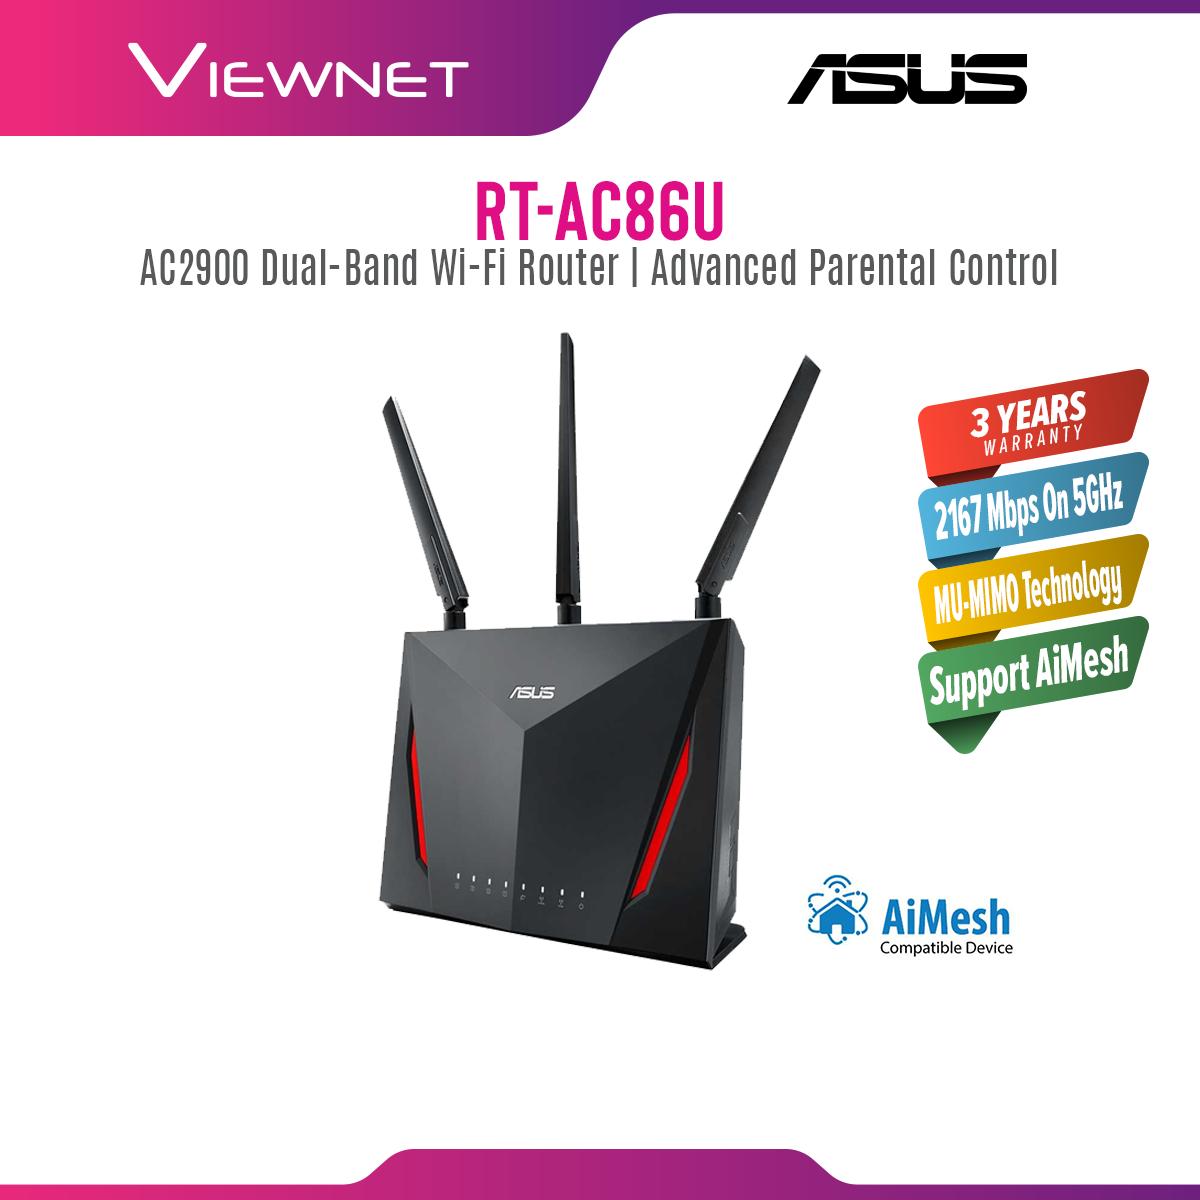 Asus RT-AC86U AC2900 AI Mesh Dual Band Gigabit WiFi Gaming Router